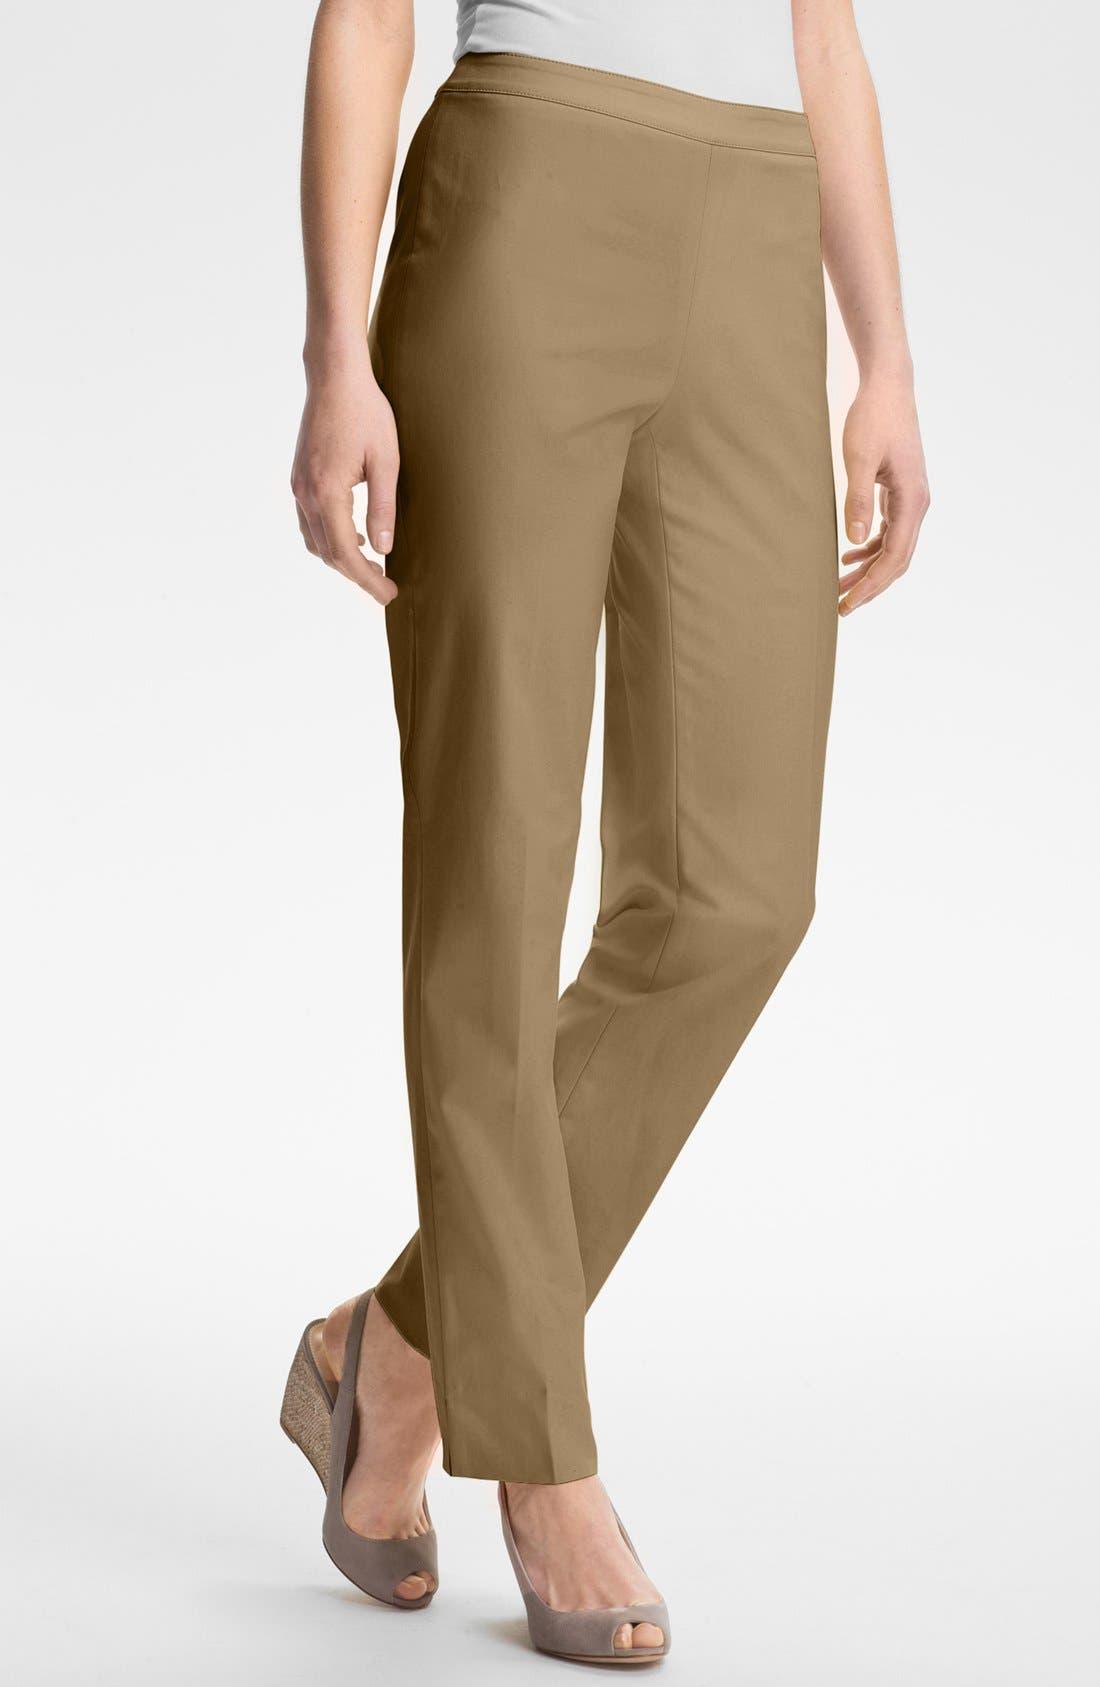 Alternate Image 1 Selected - Lafayette 148 New York 'Bleecker - Metropolitan' Stretch Pants